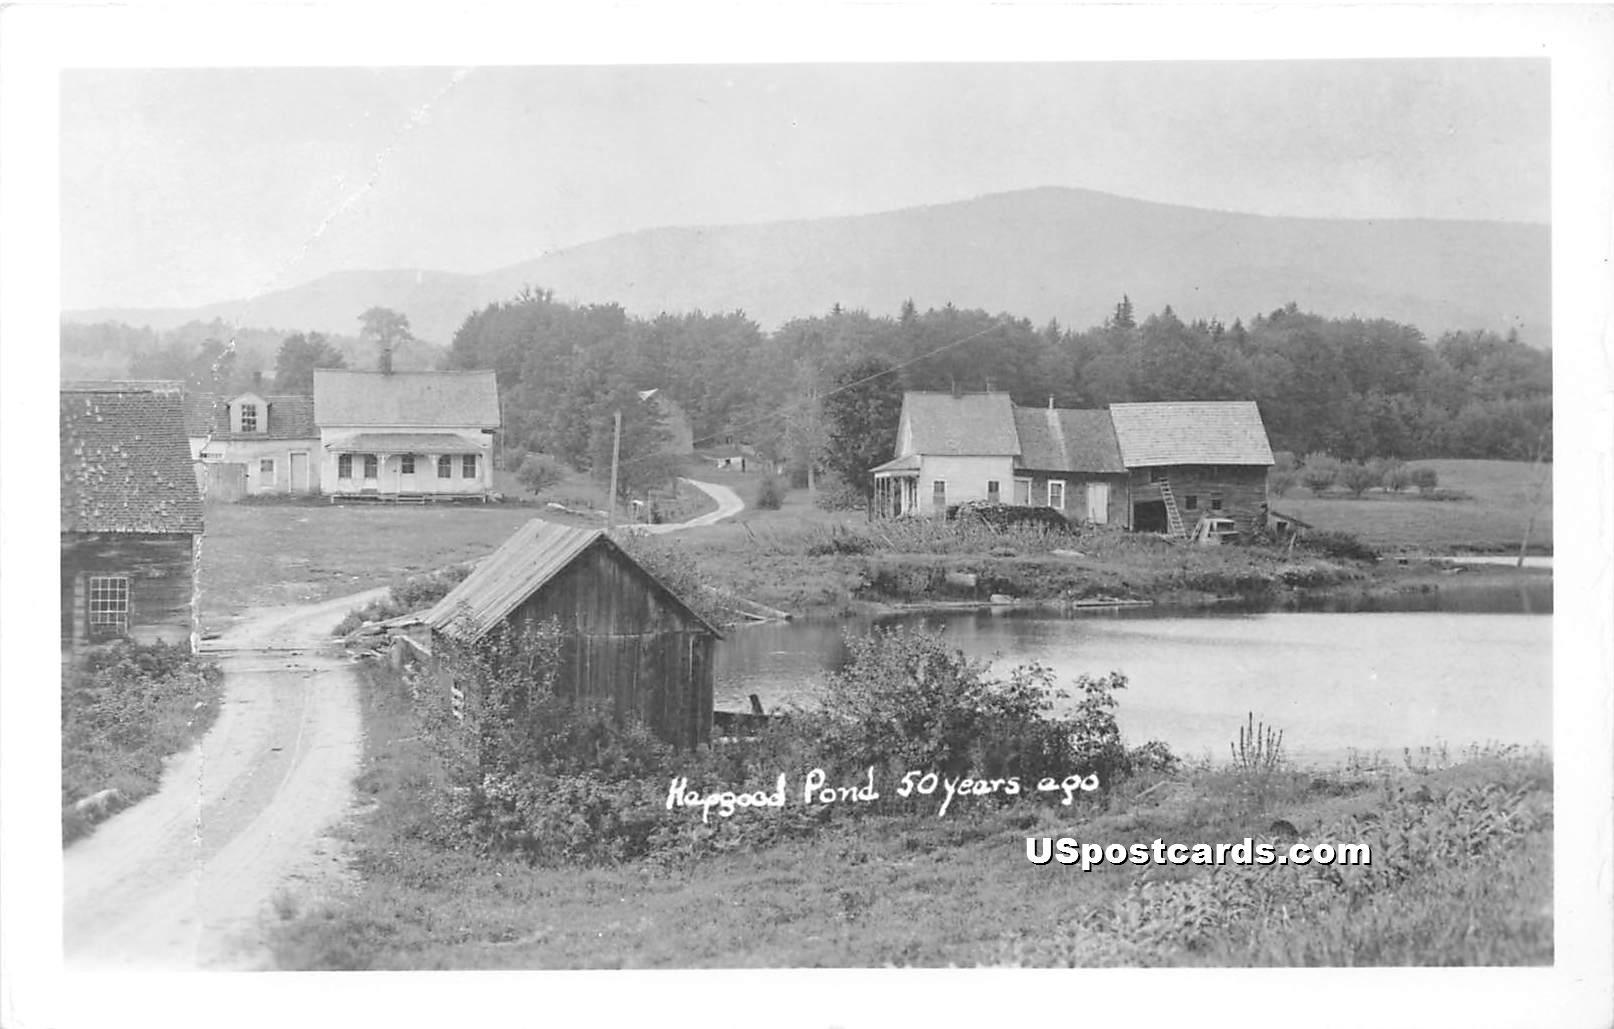 Road Scene - Hapgood Pond, Vermont VT Postcard